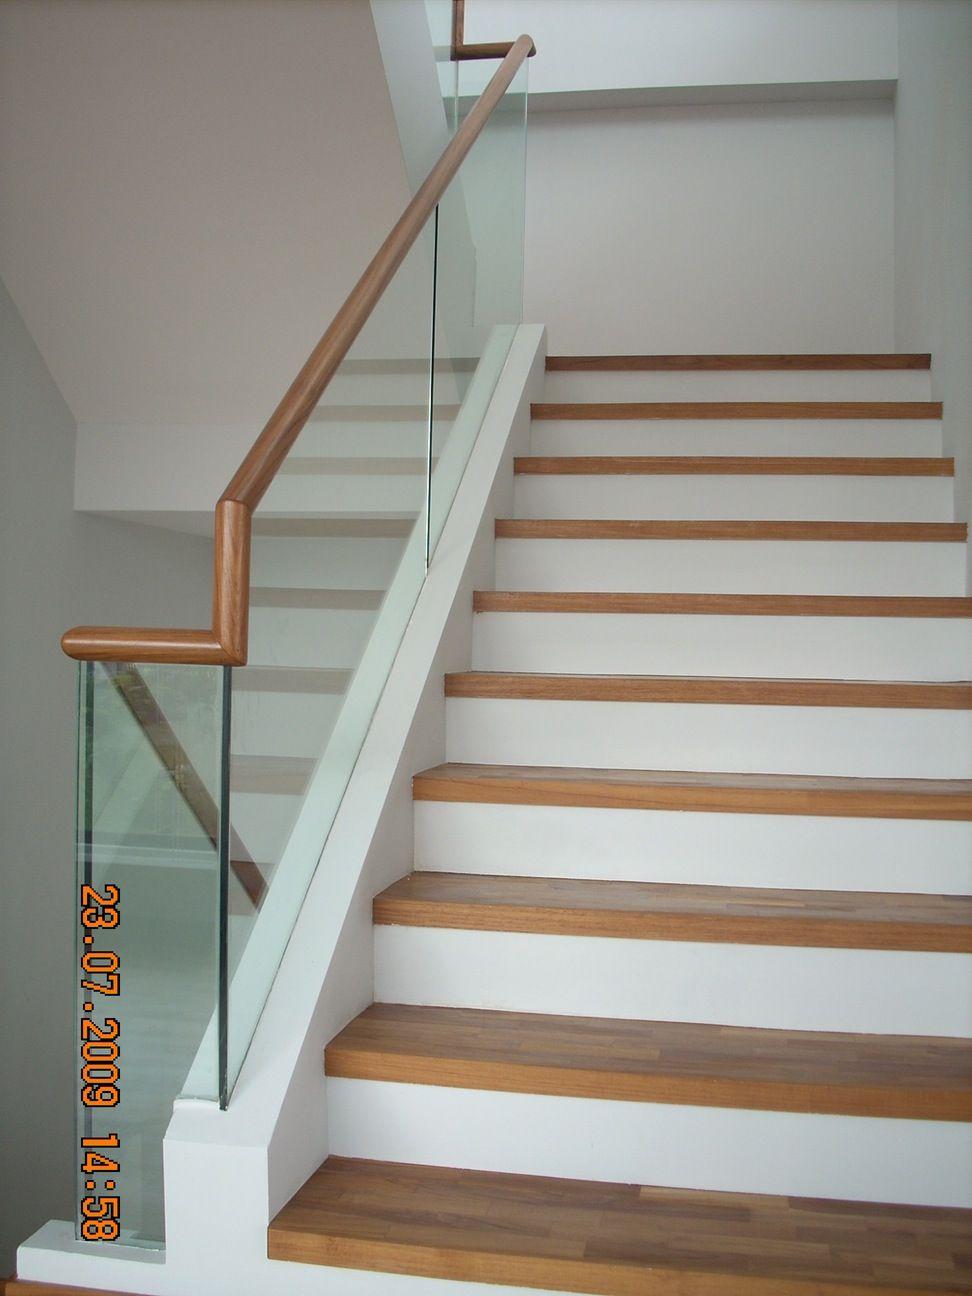 Frameless Staircase Railing Glass Ccn Aluminium Stair Case_glass